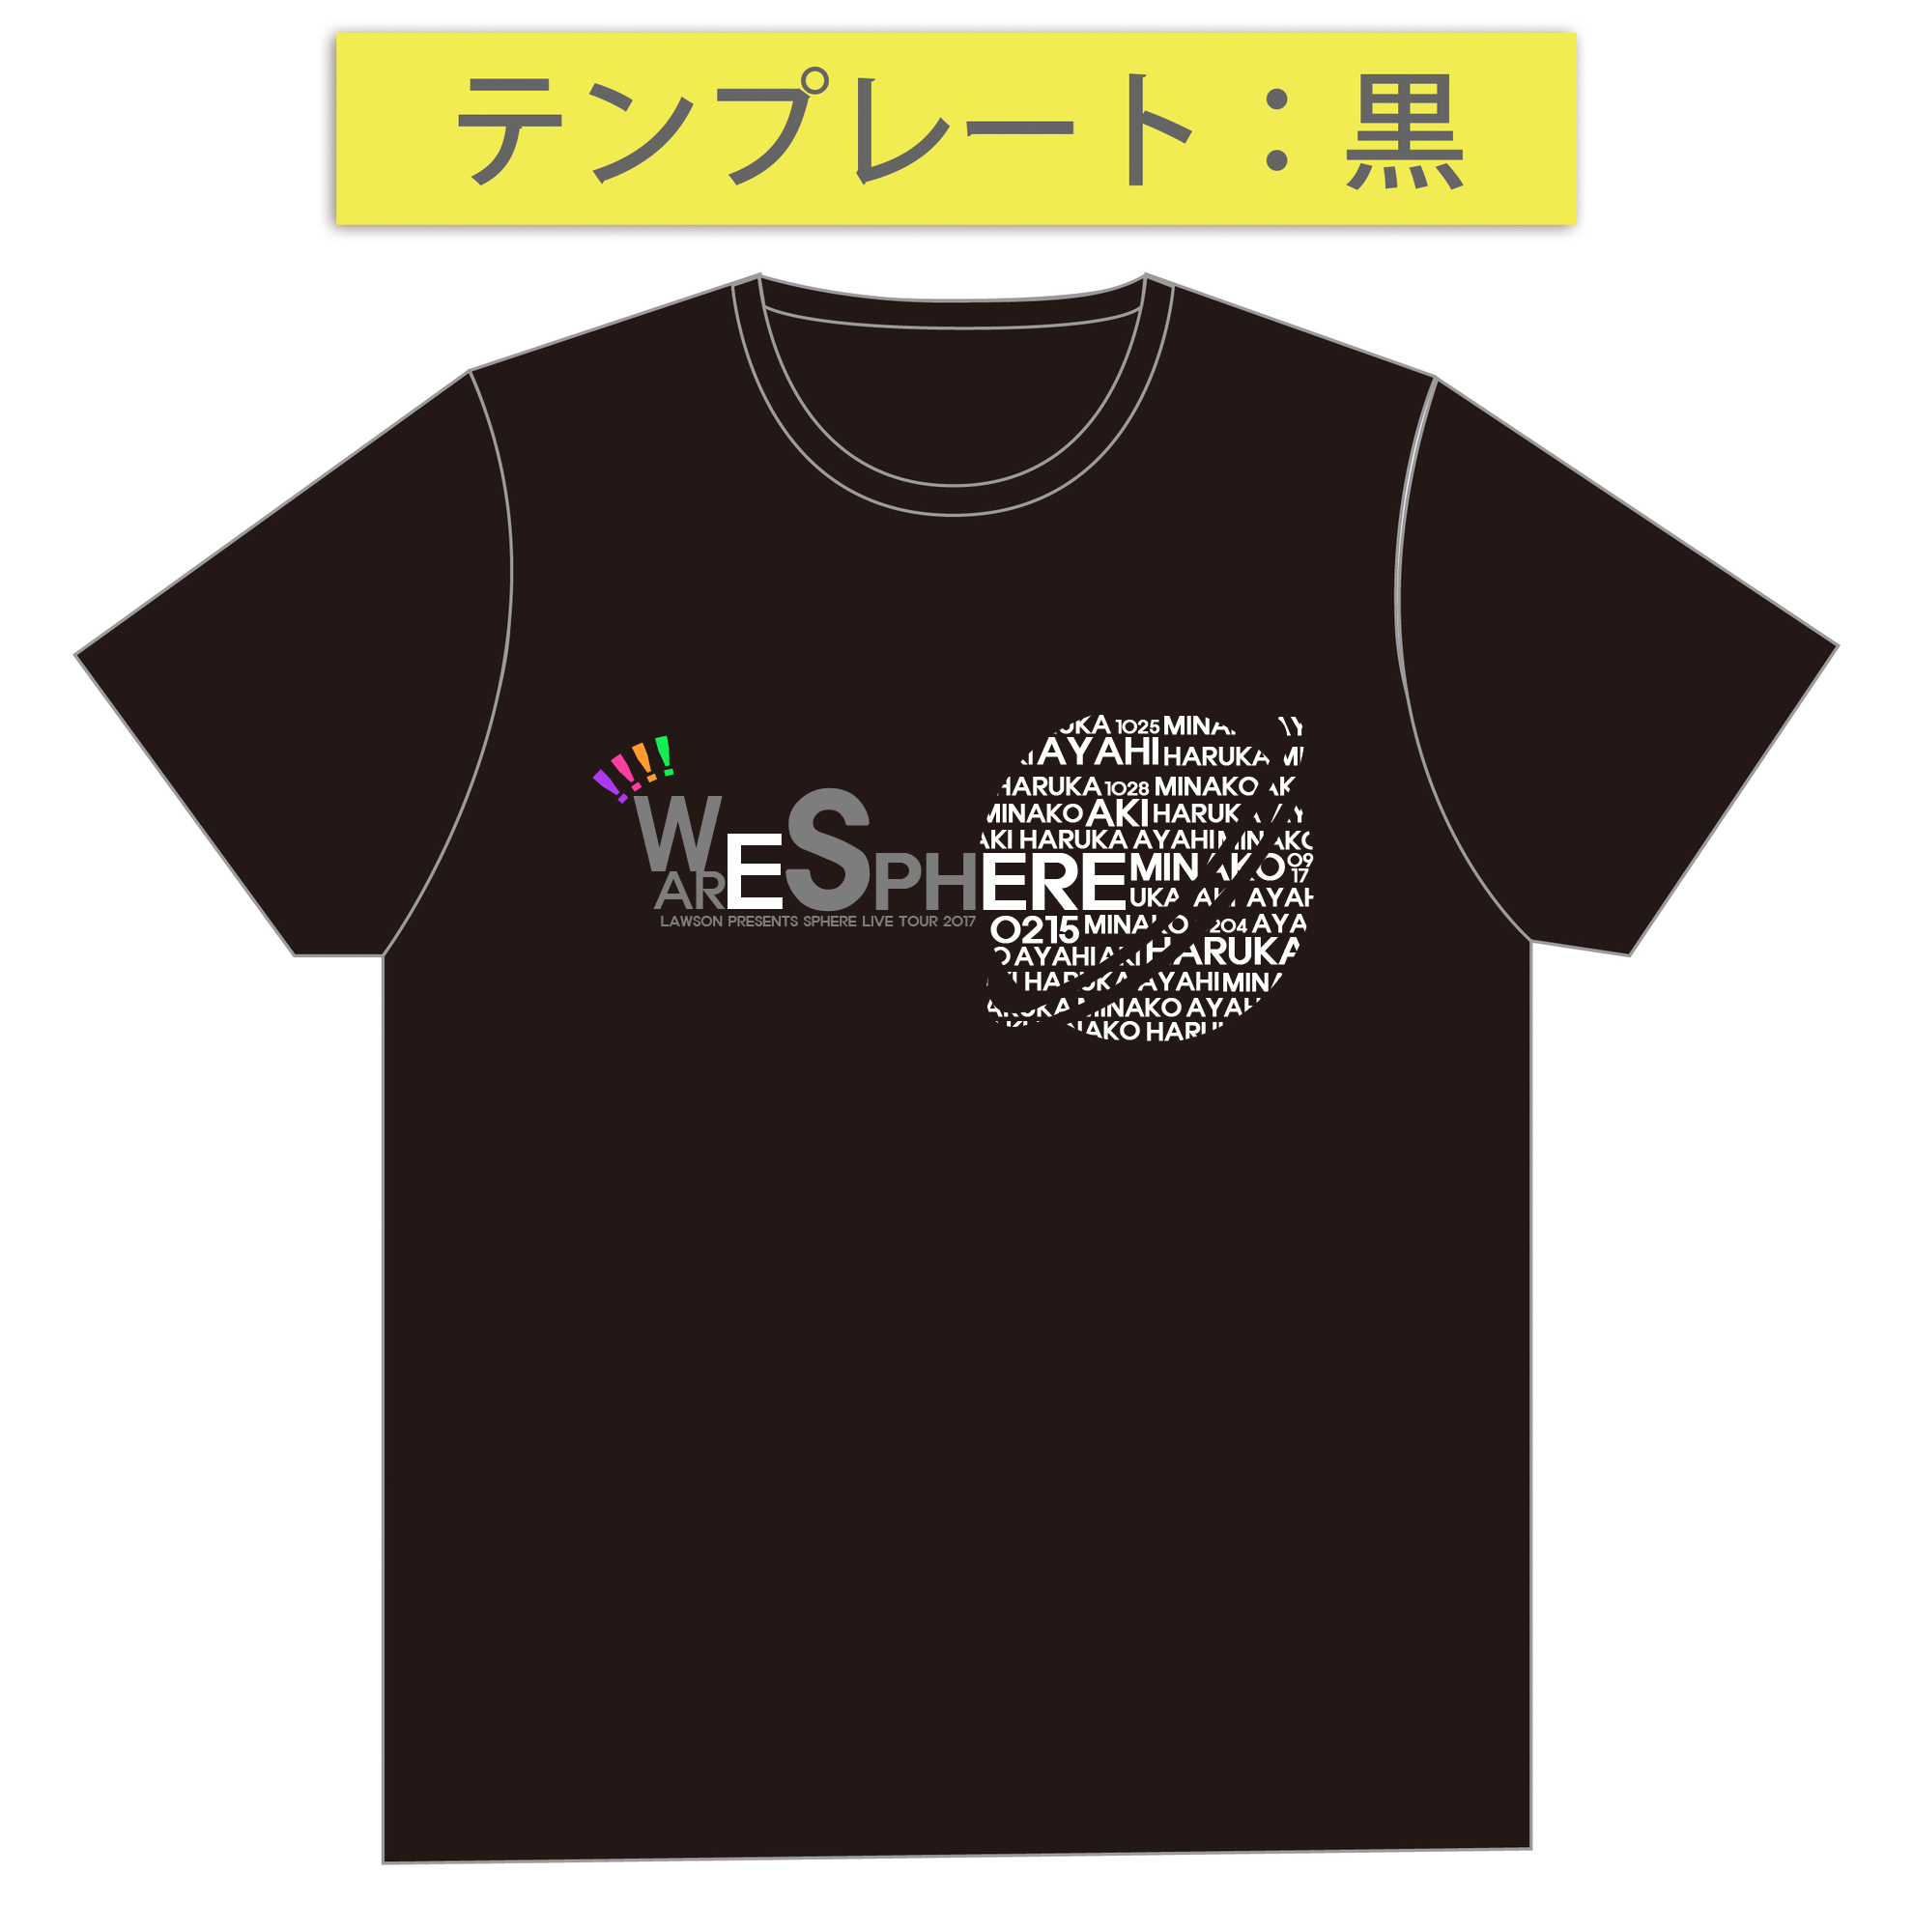 Content_tshirt_sample1